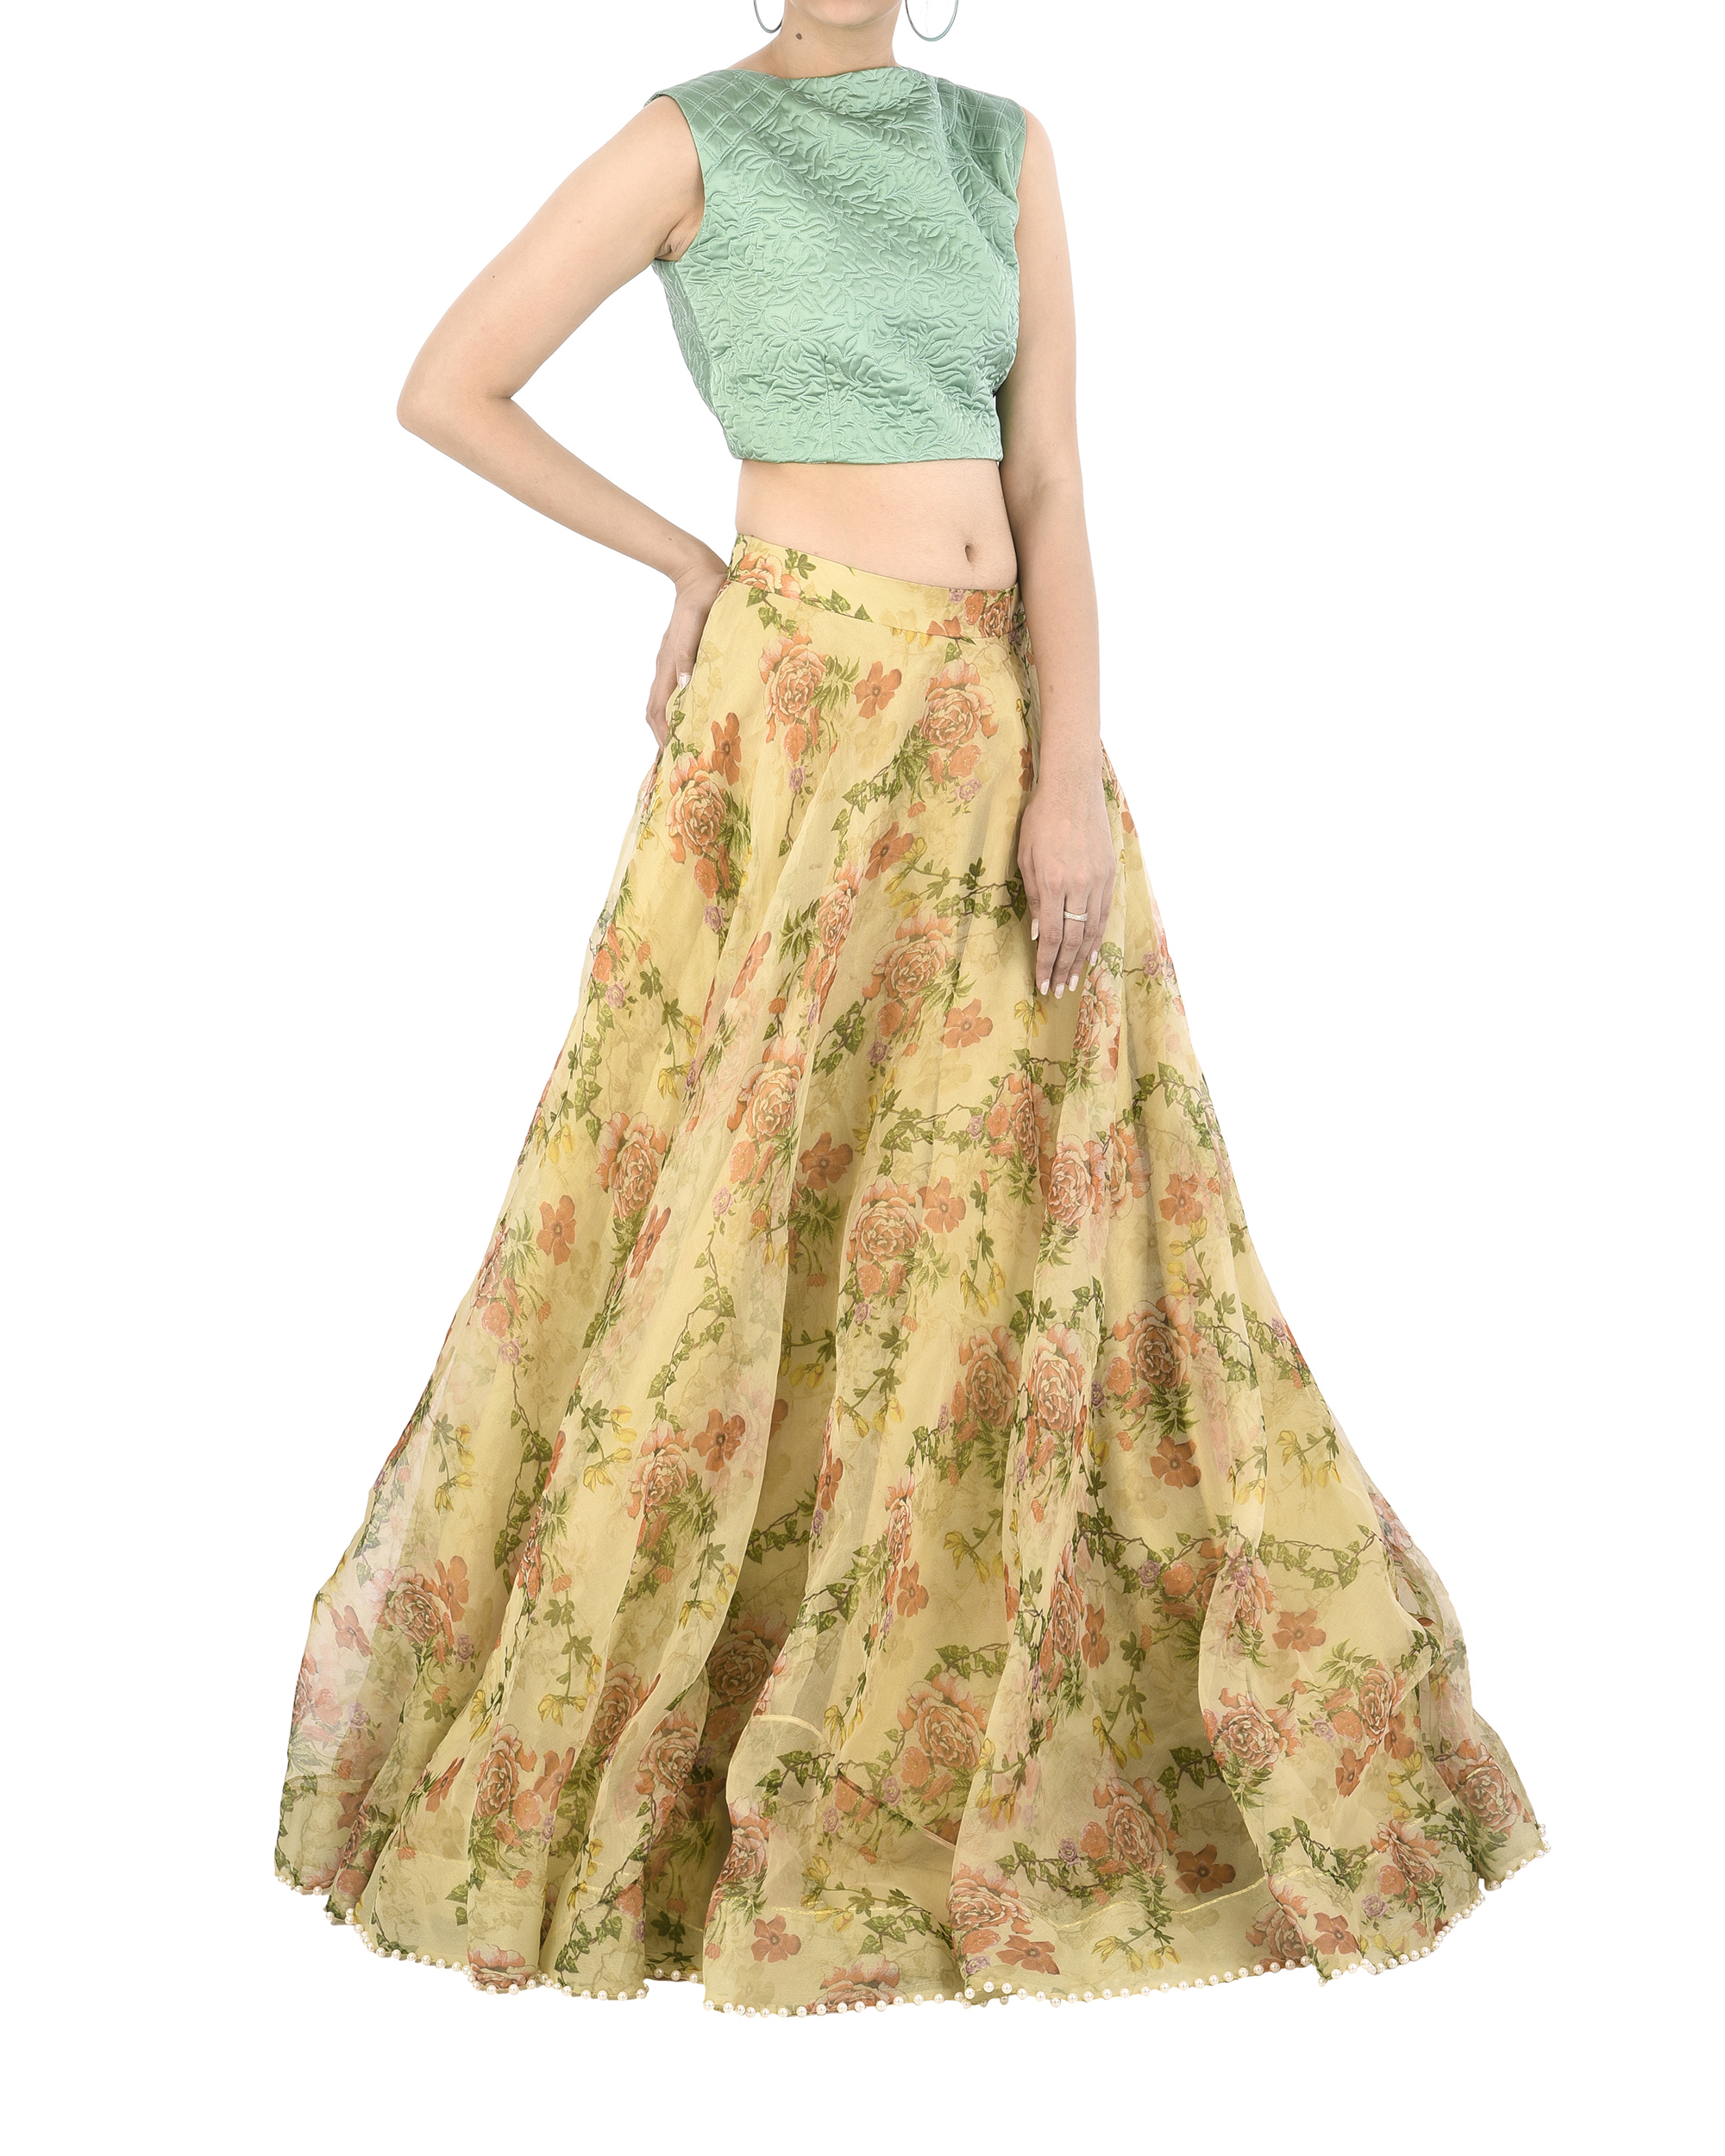 828f6c3a7d Floral organza lehenga skirt by Archana Rao | The Secret Label